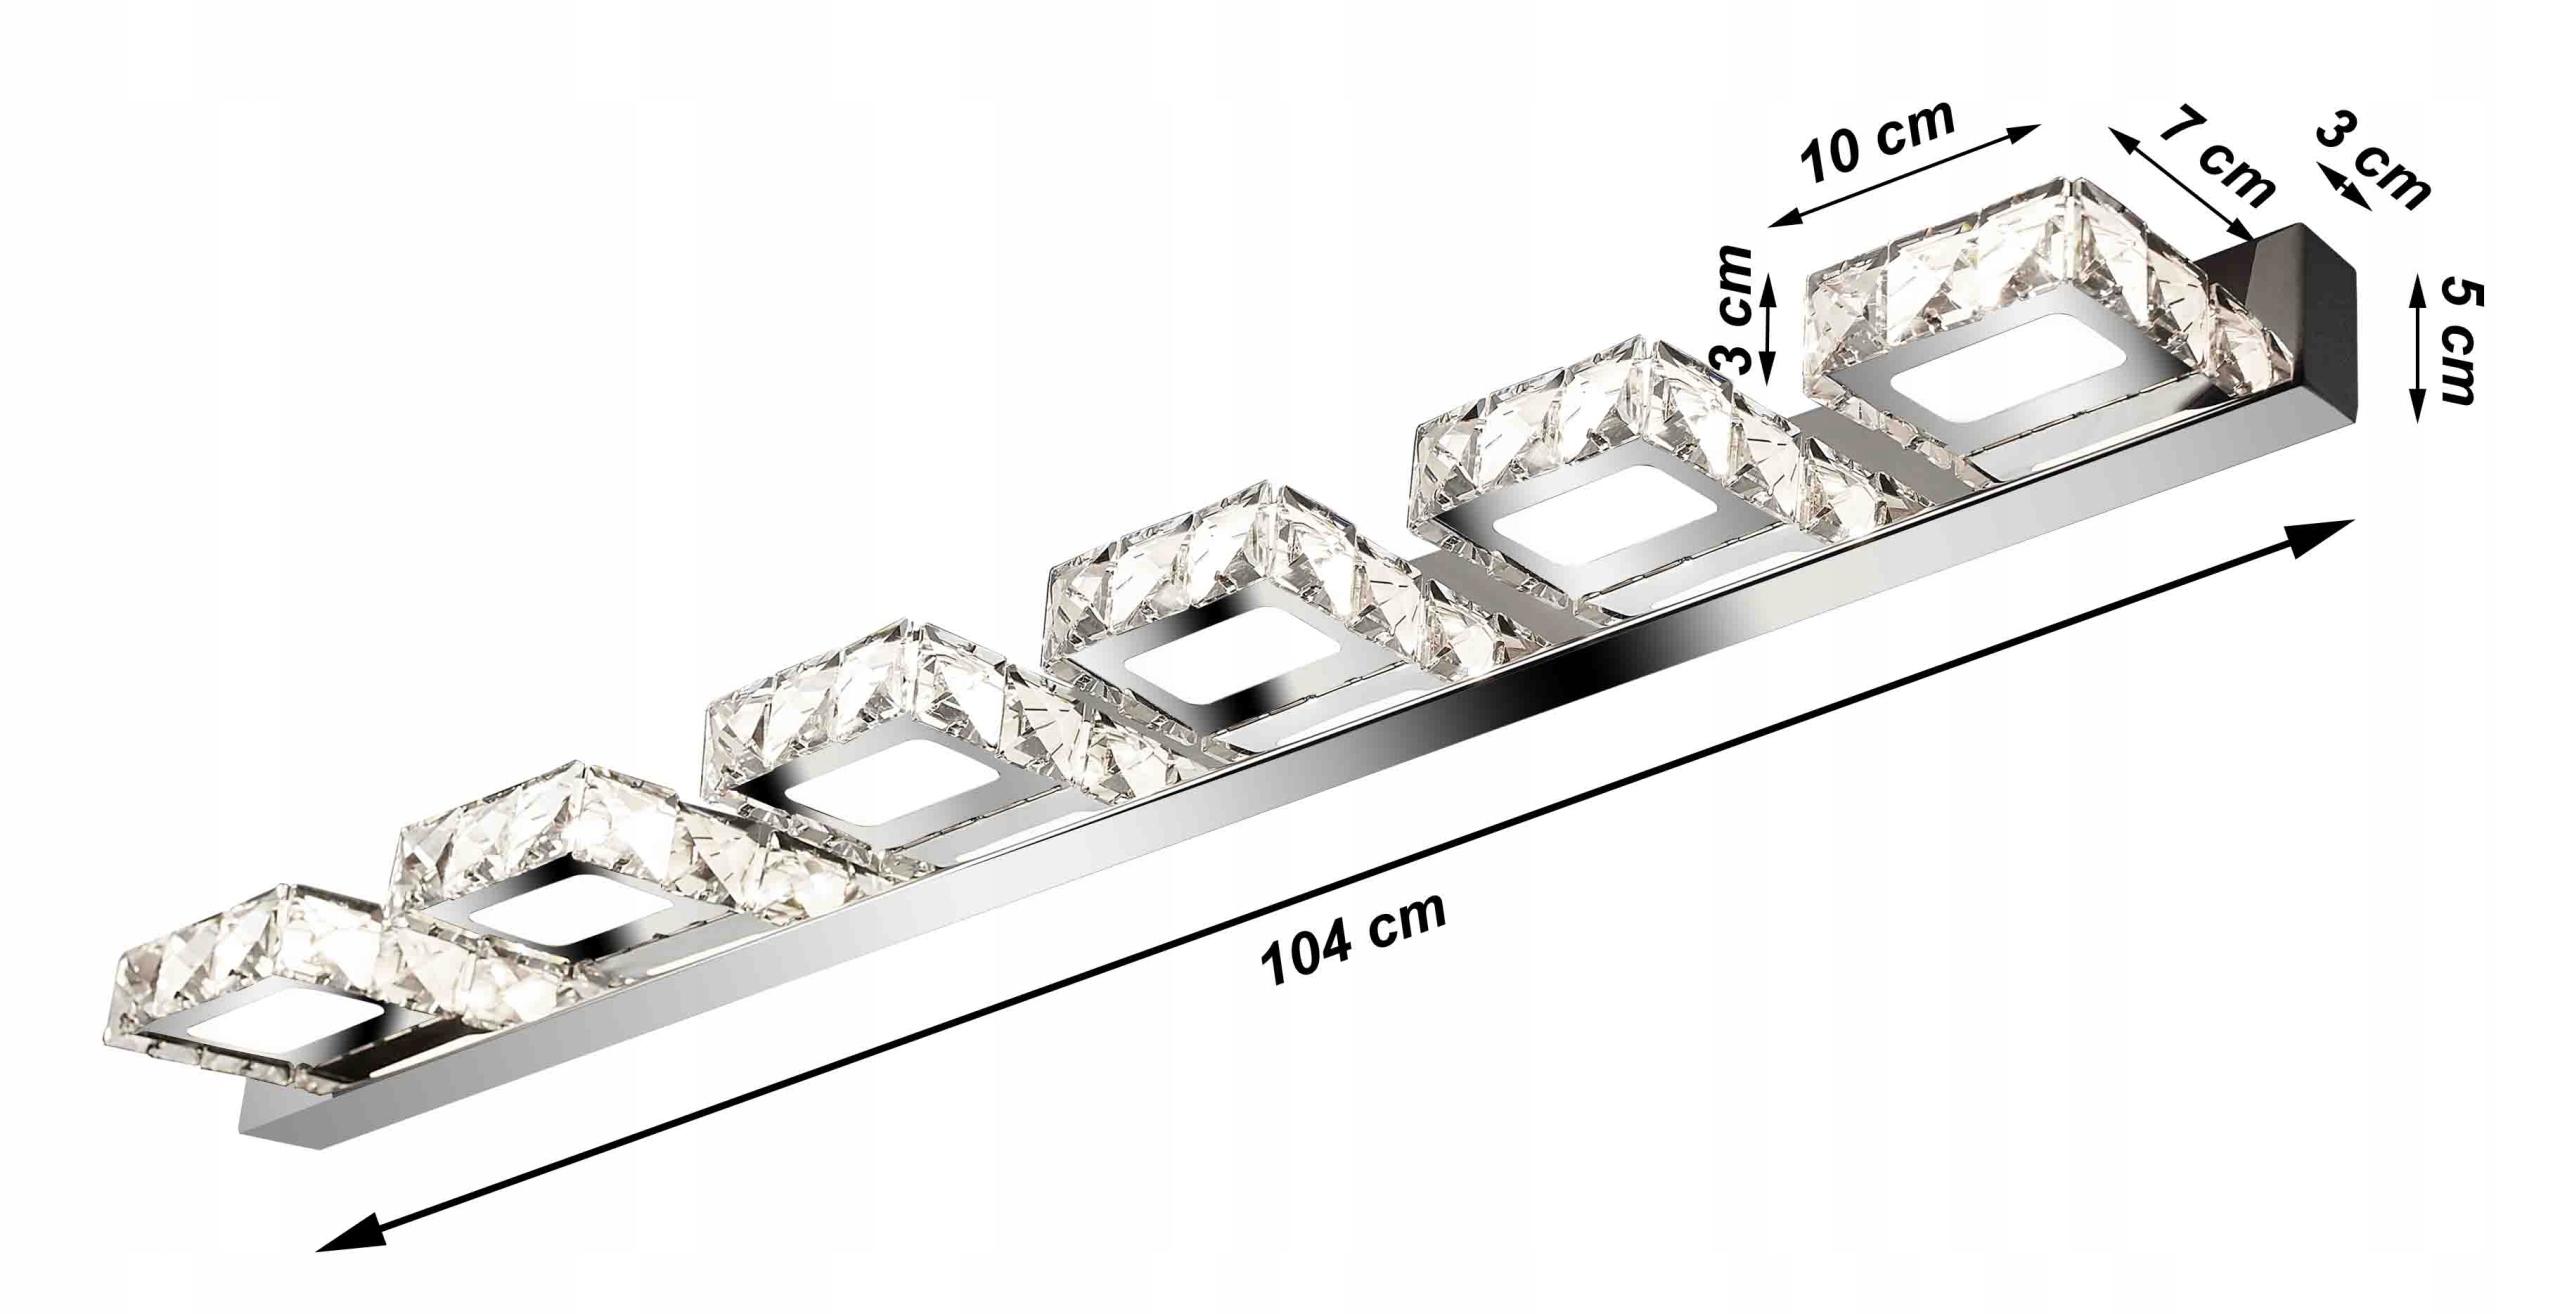 Lampa ścienna, szklane kryształki 104cm - Meteor Line VI